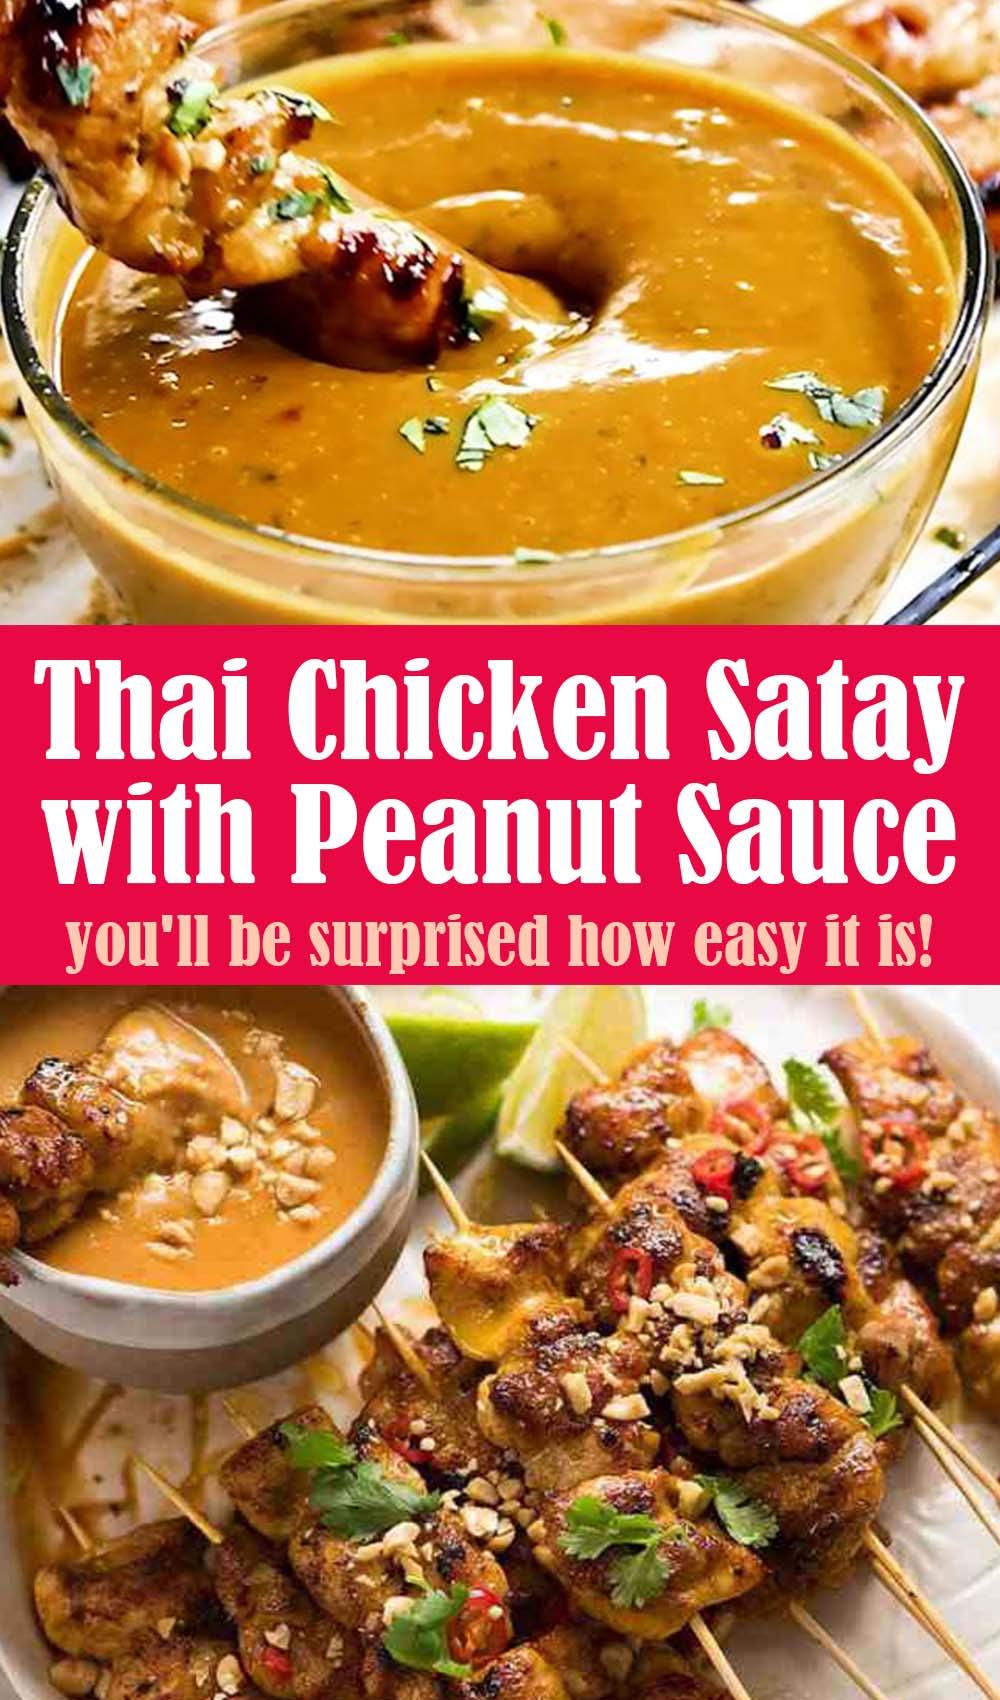 Thai Chicken Satay with Peanut Sauce Recipe